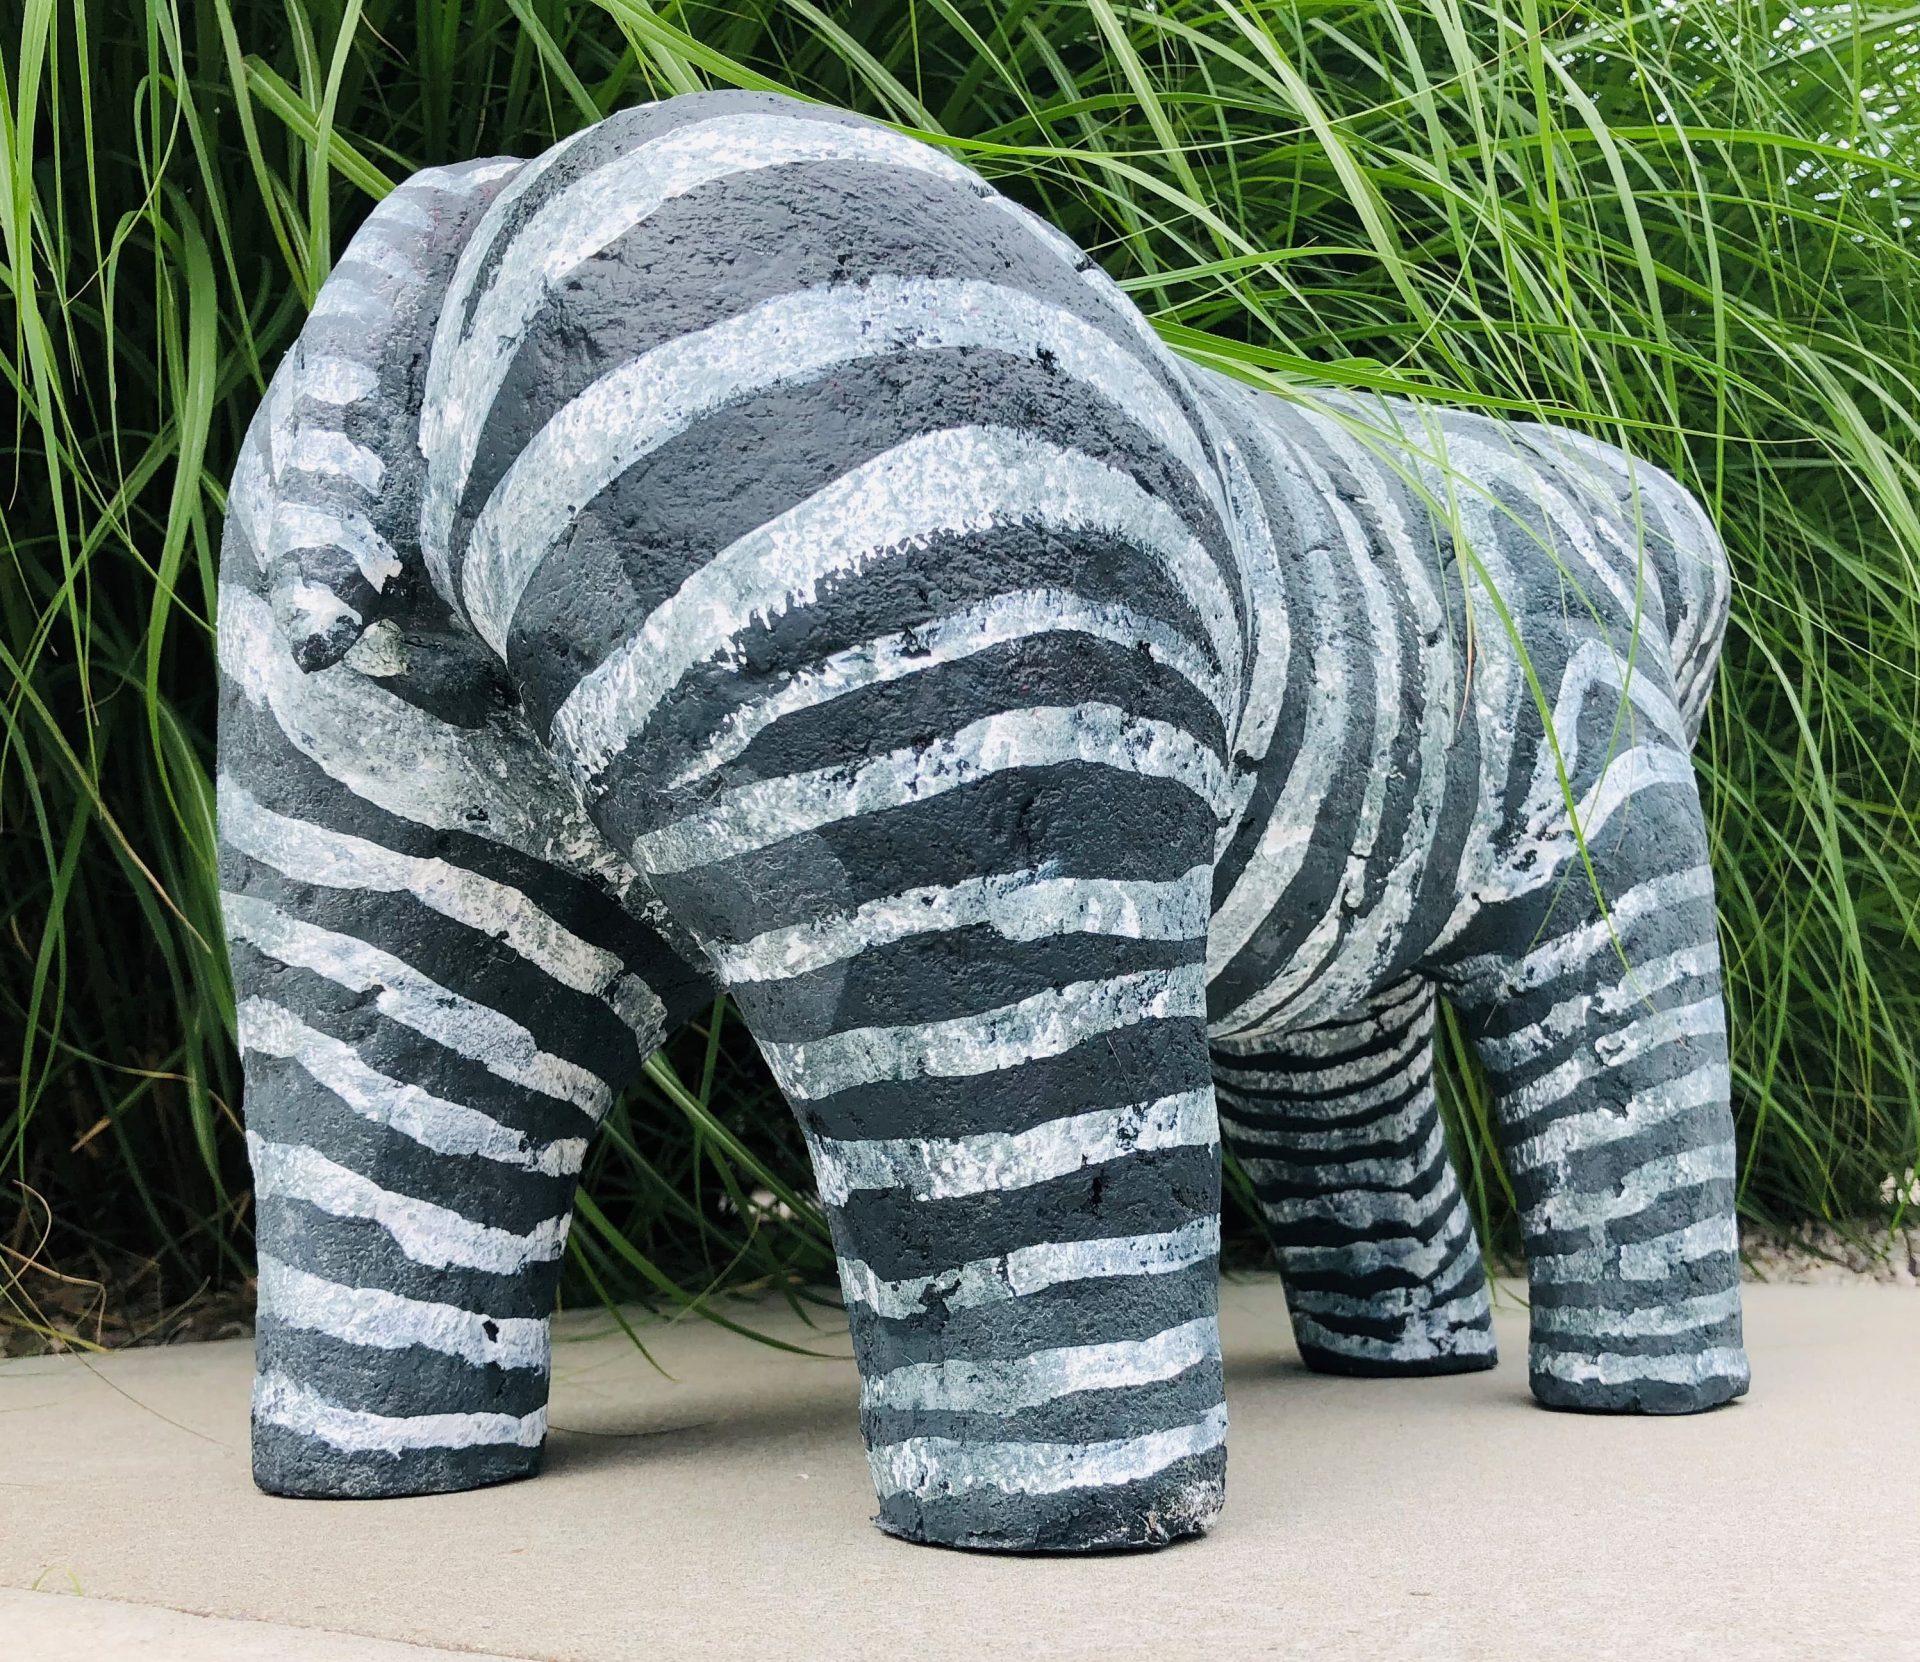 [:nl]oerbeest oebra of zebroe in graffiti [:fr]oerbeest oebra of zebroe in graffiti k[:en]oerbeest oebra of zebroe in graffiti k[:]